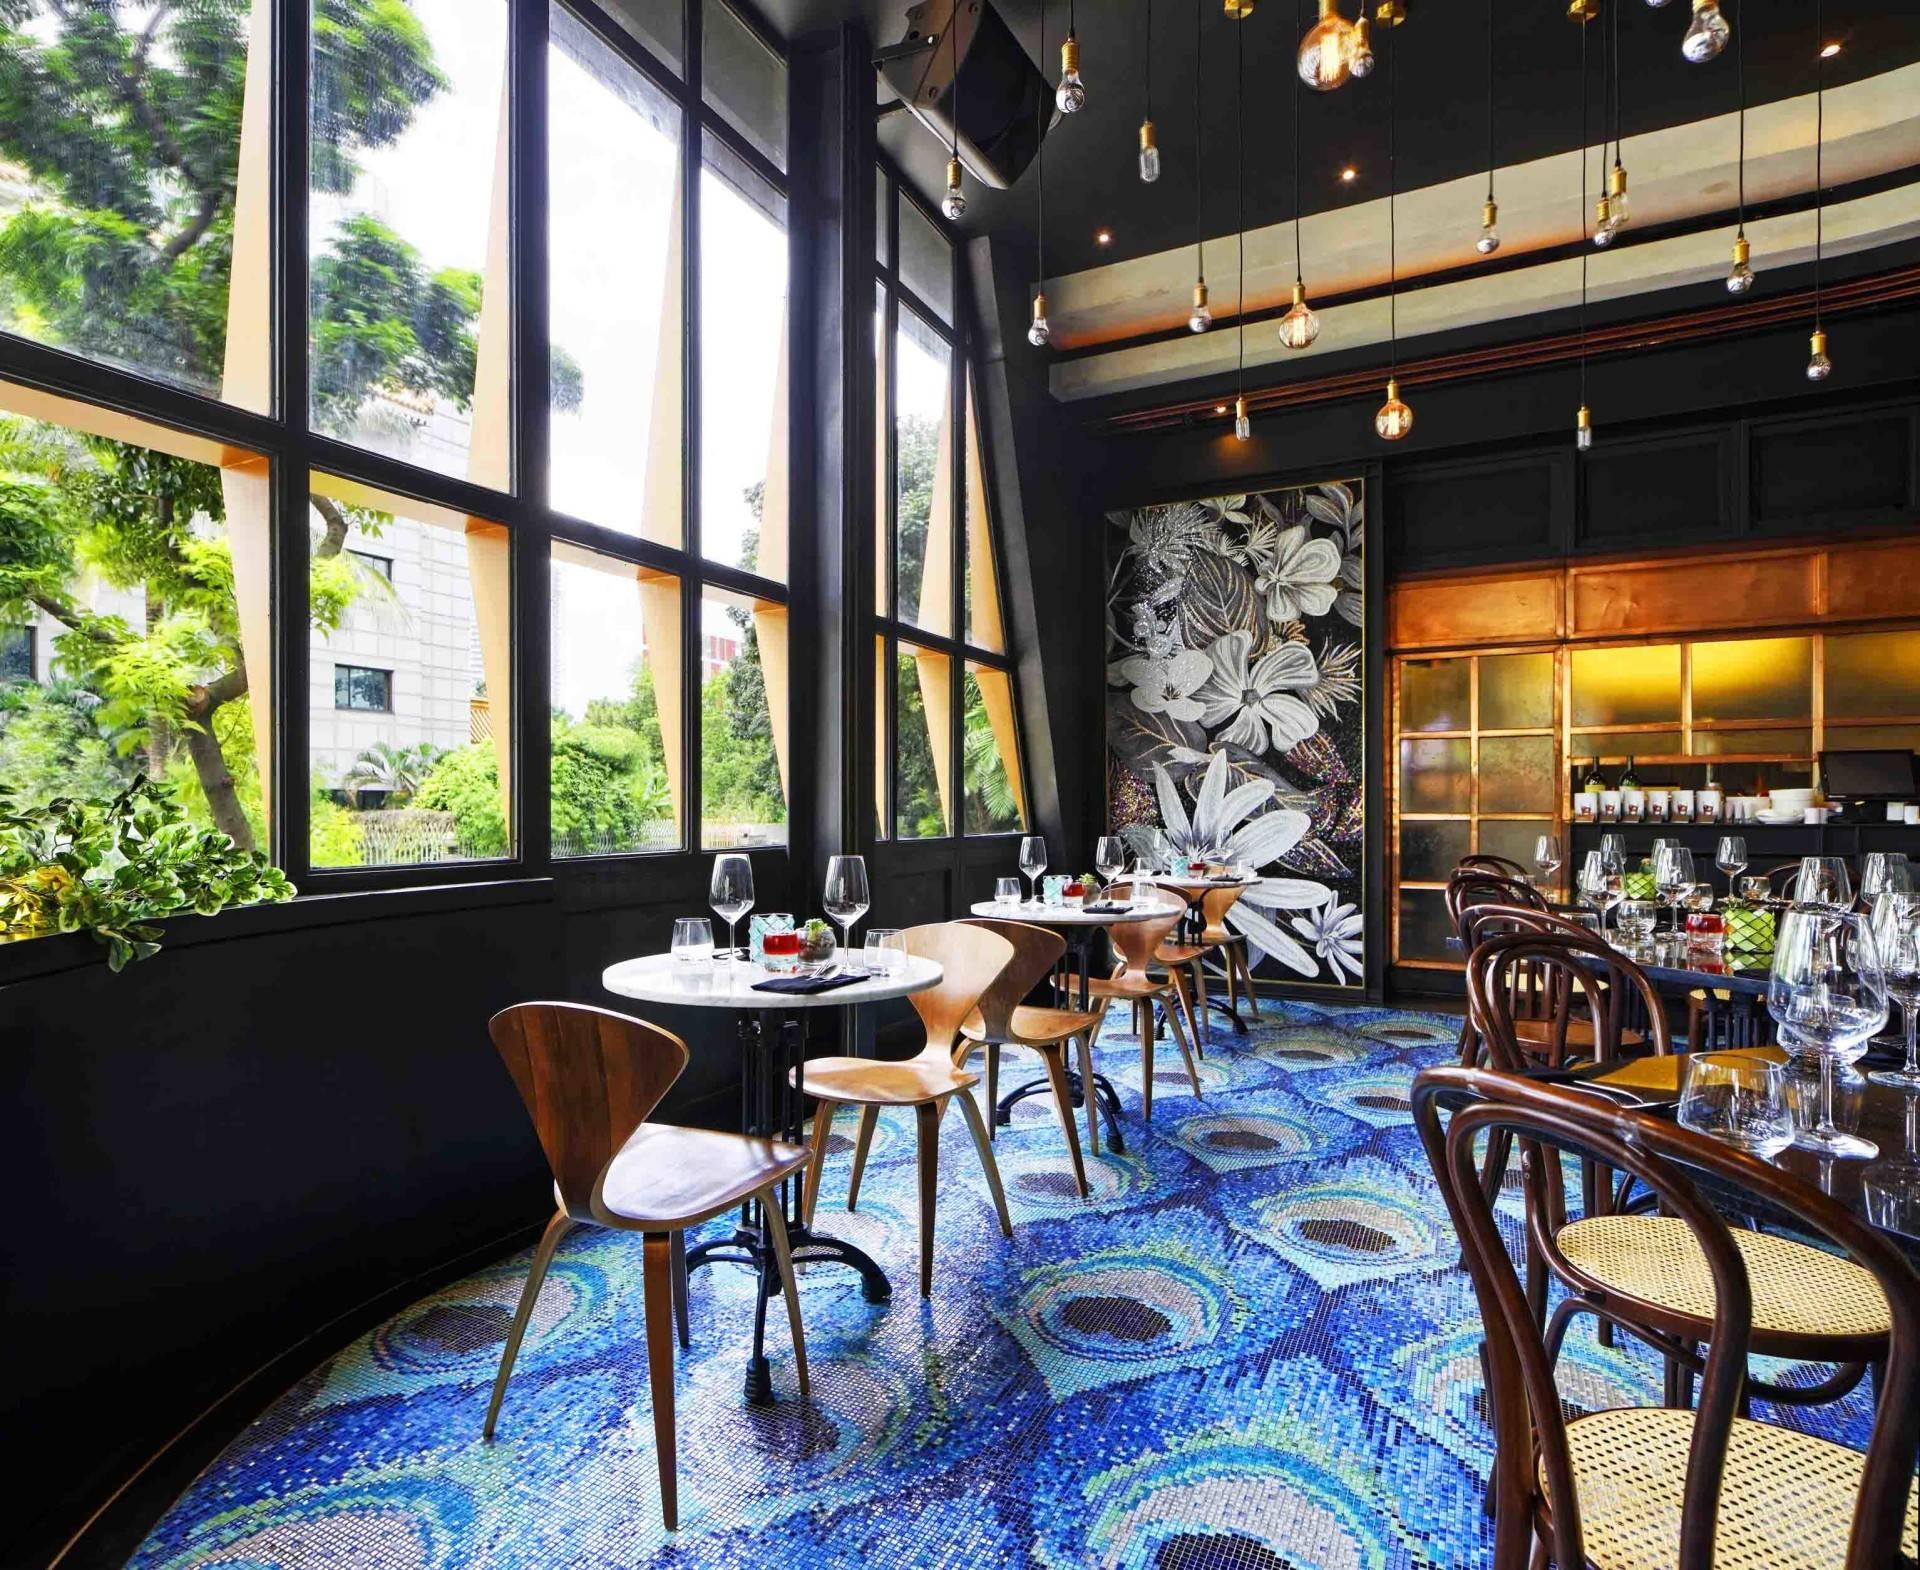 Leo Einstein Fransiscus Bottega Ristorante Mega Kuningan Mega Kuningan Seating Area Restaurant   7846